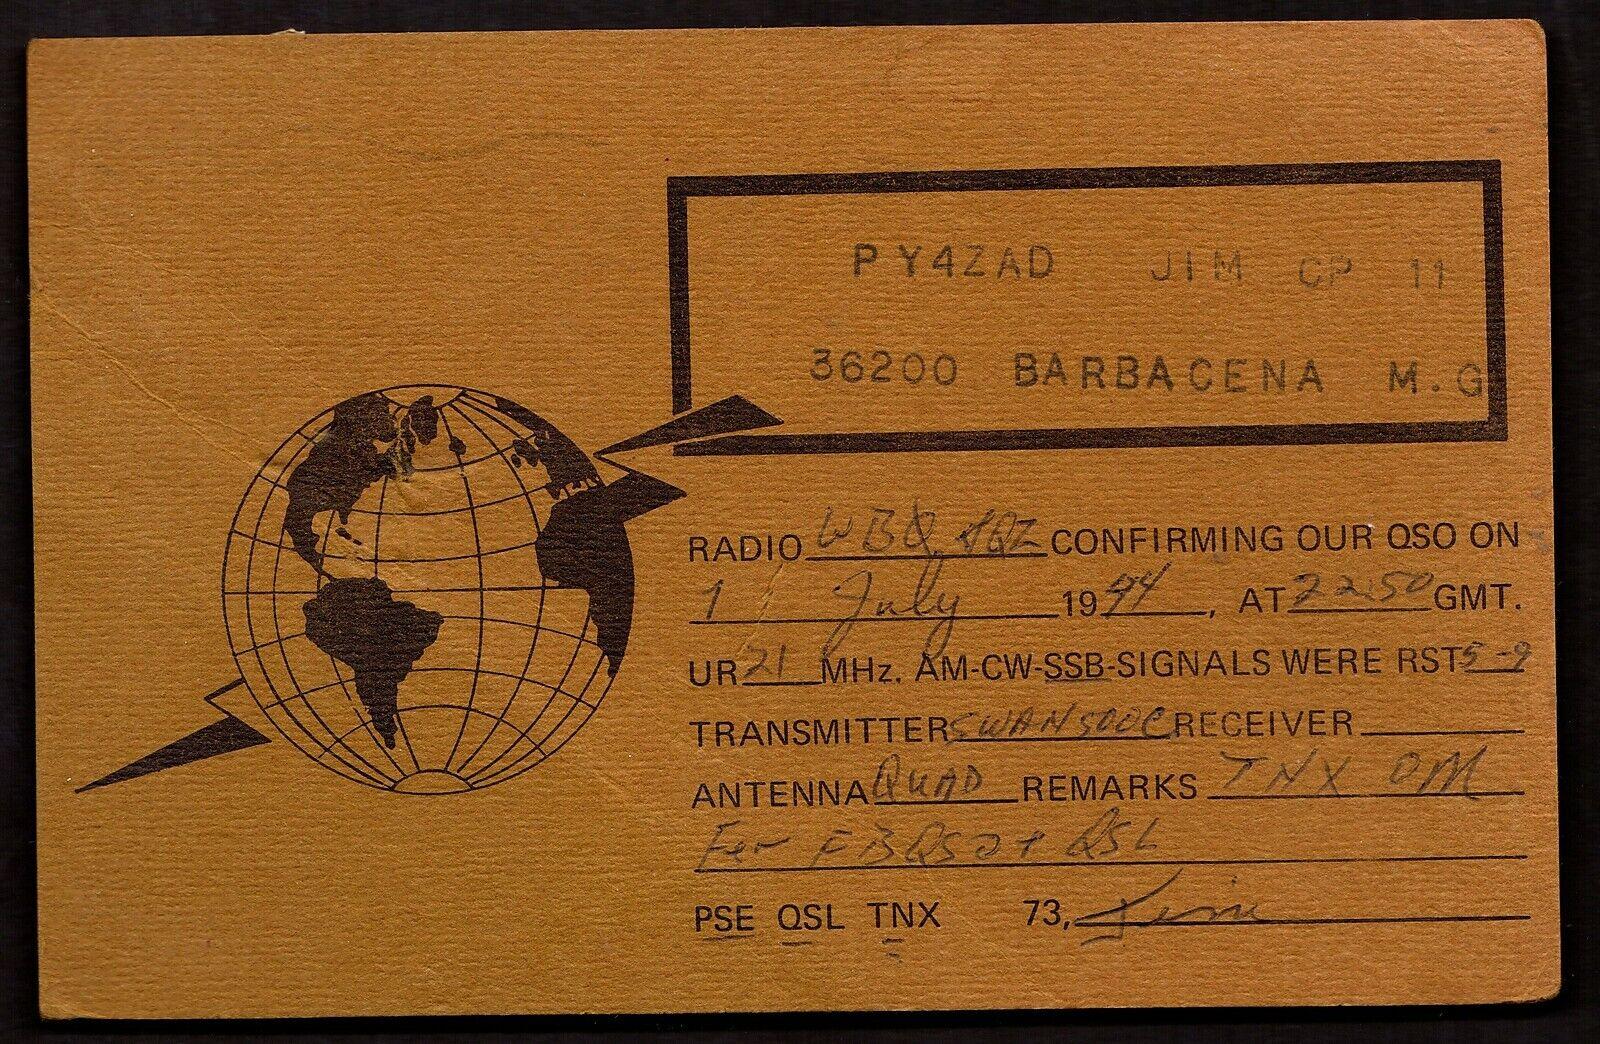 QSL QSO RADIO CARD Pic of Globe,Signal,Barbacena M. G., Brazil (Q2953)